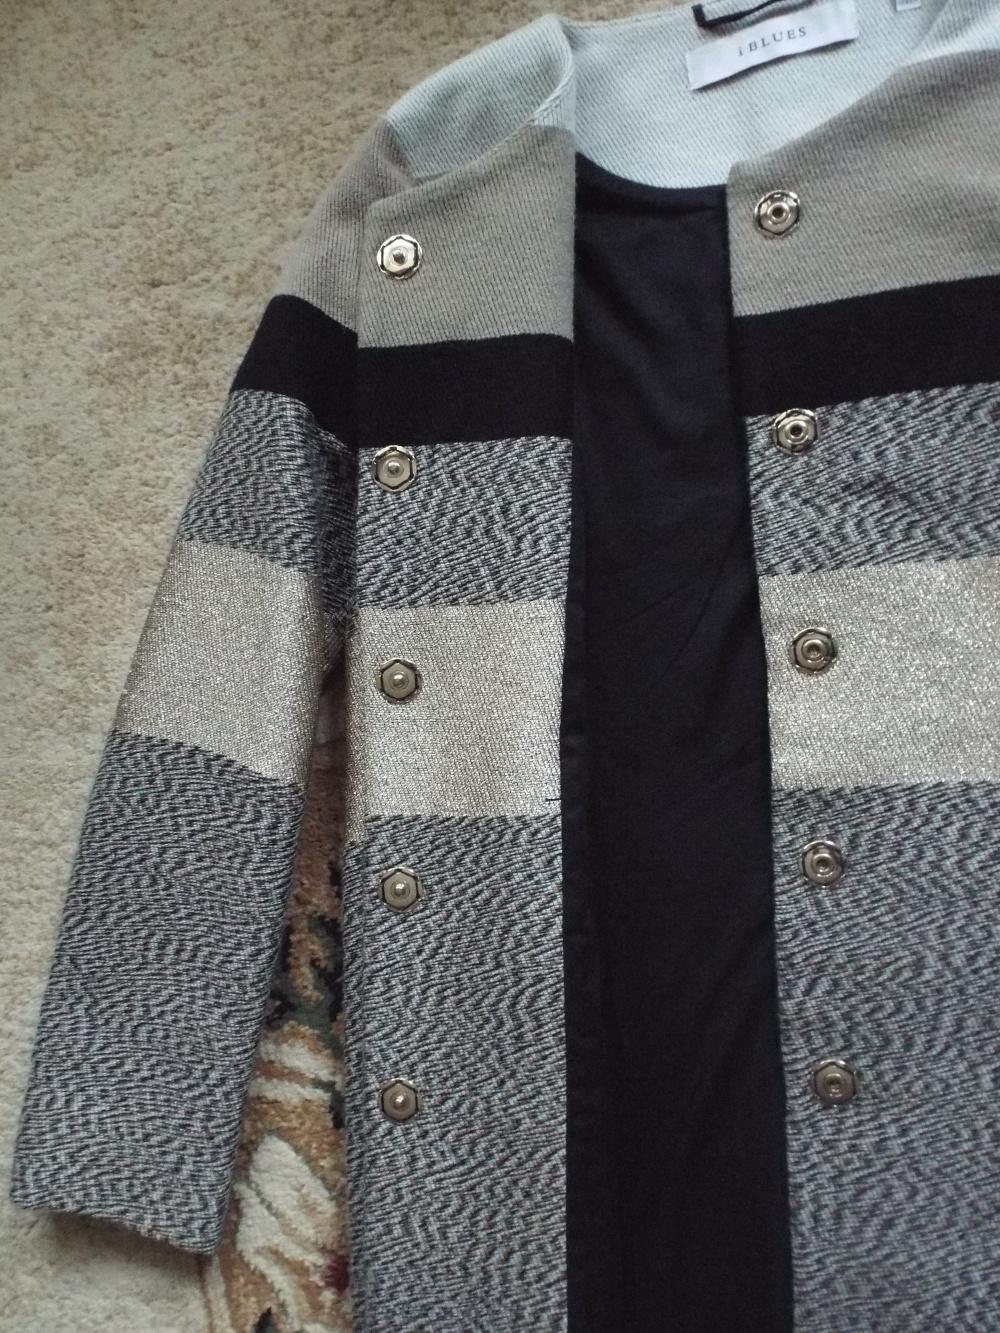 Пальто, i BLUES, размер 44, 44-46 (росс.).